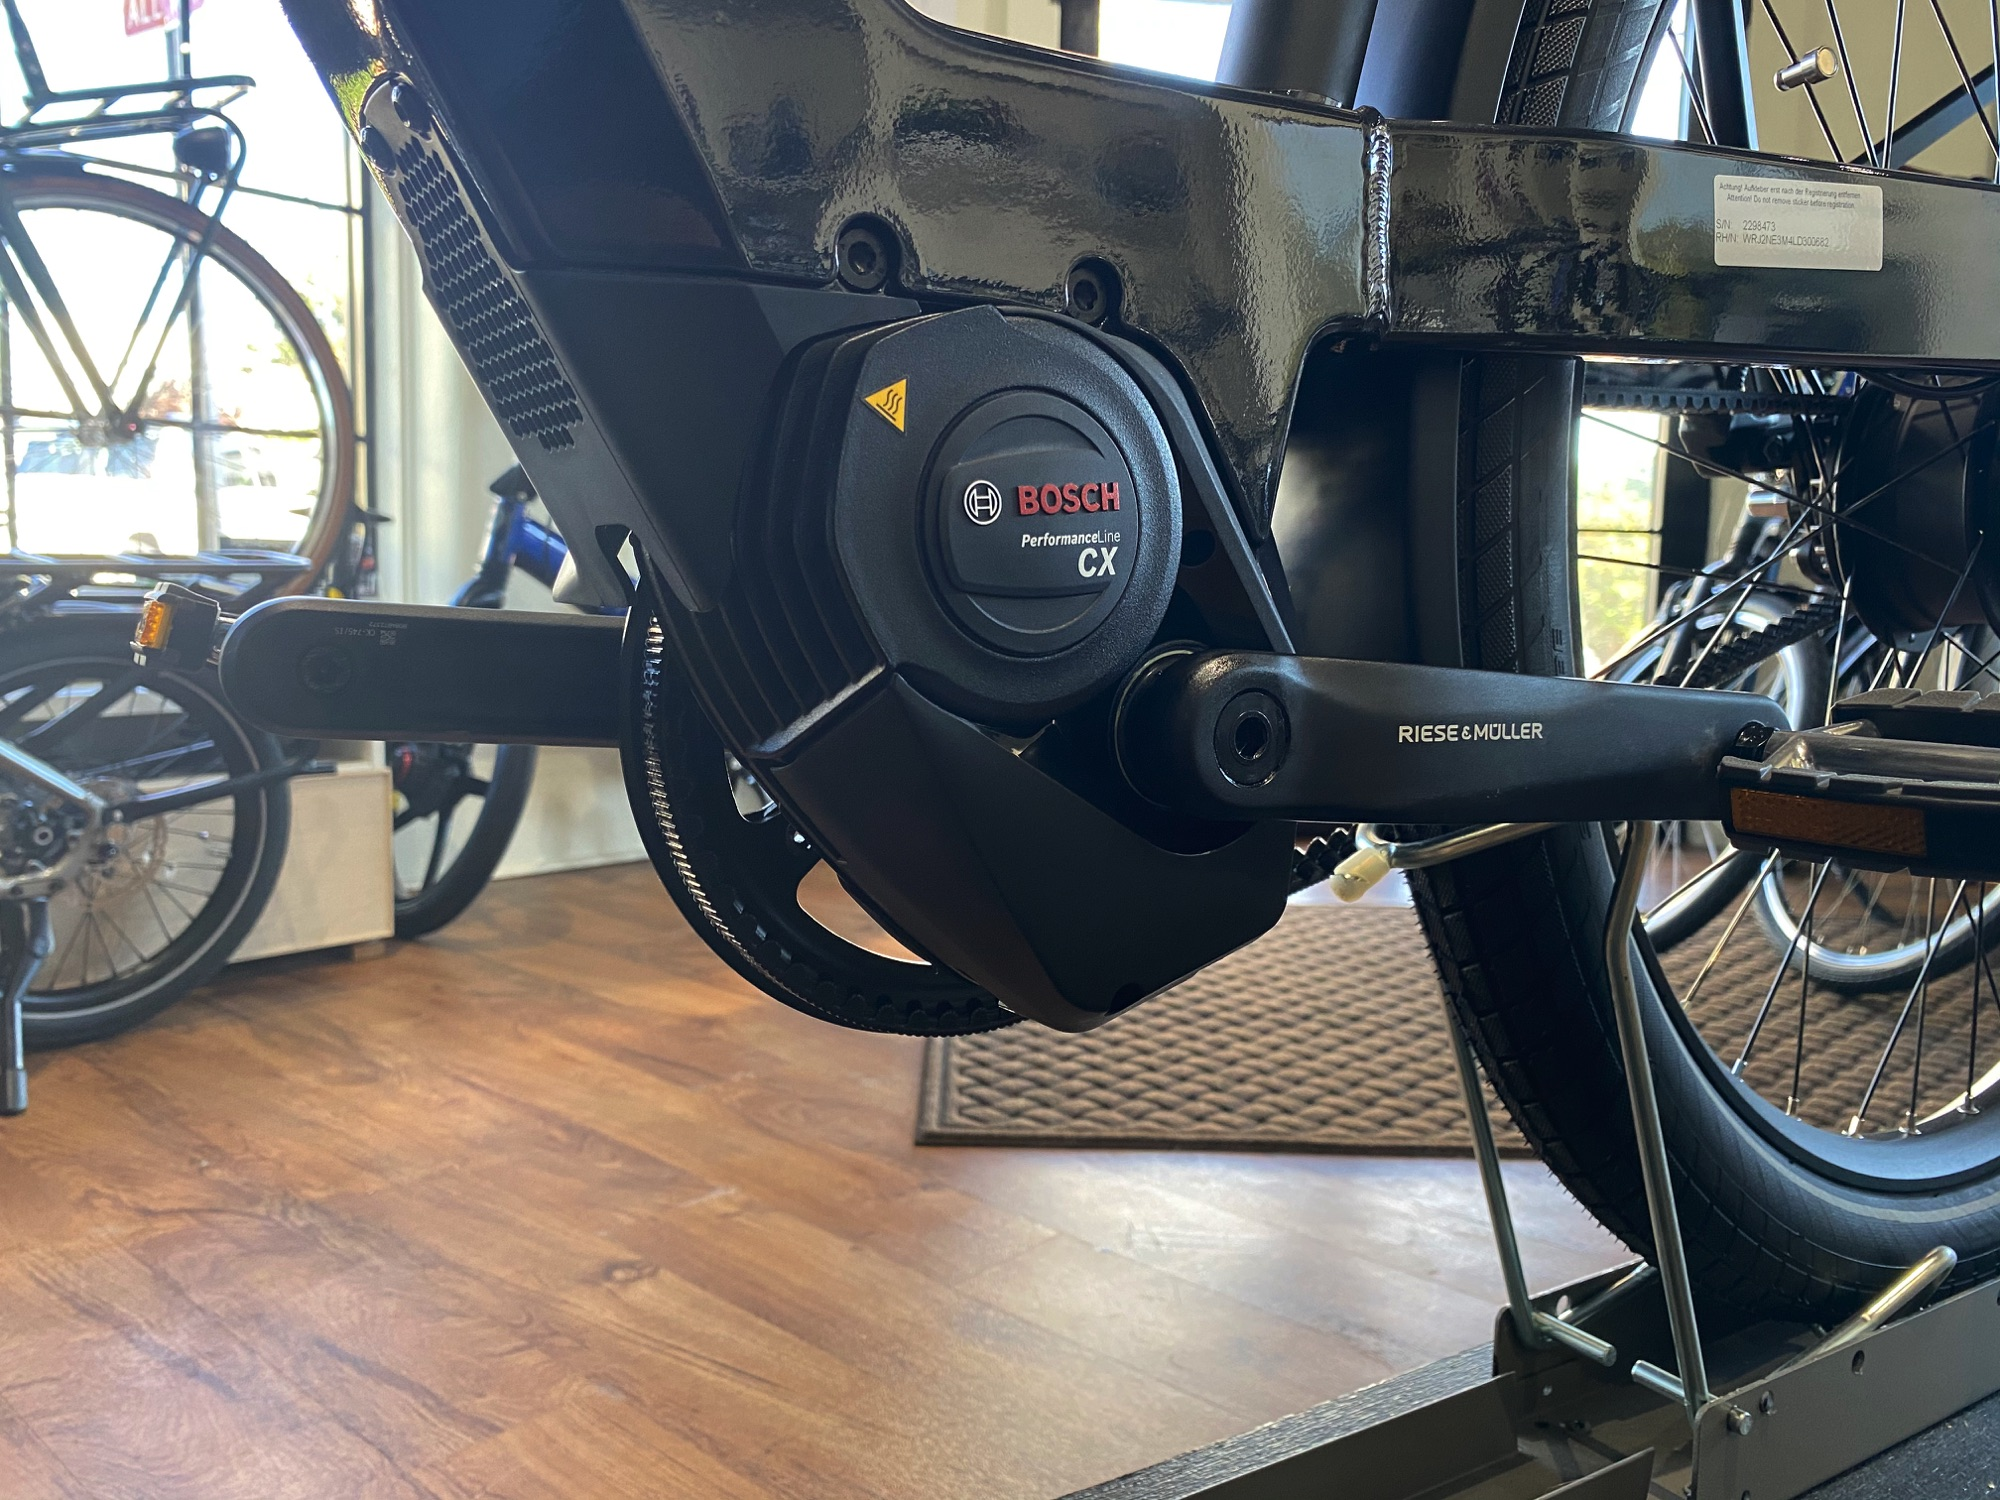 2021 Riese & Muller Nevo3 Vario, Kiox, 625 Wh Battery